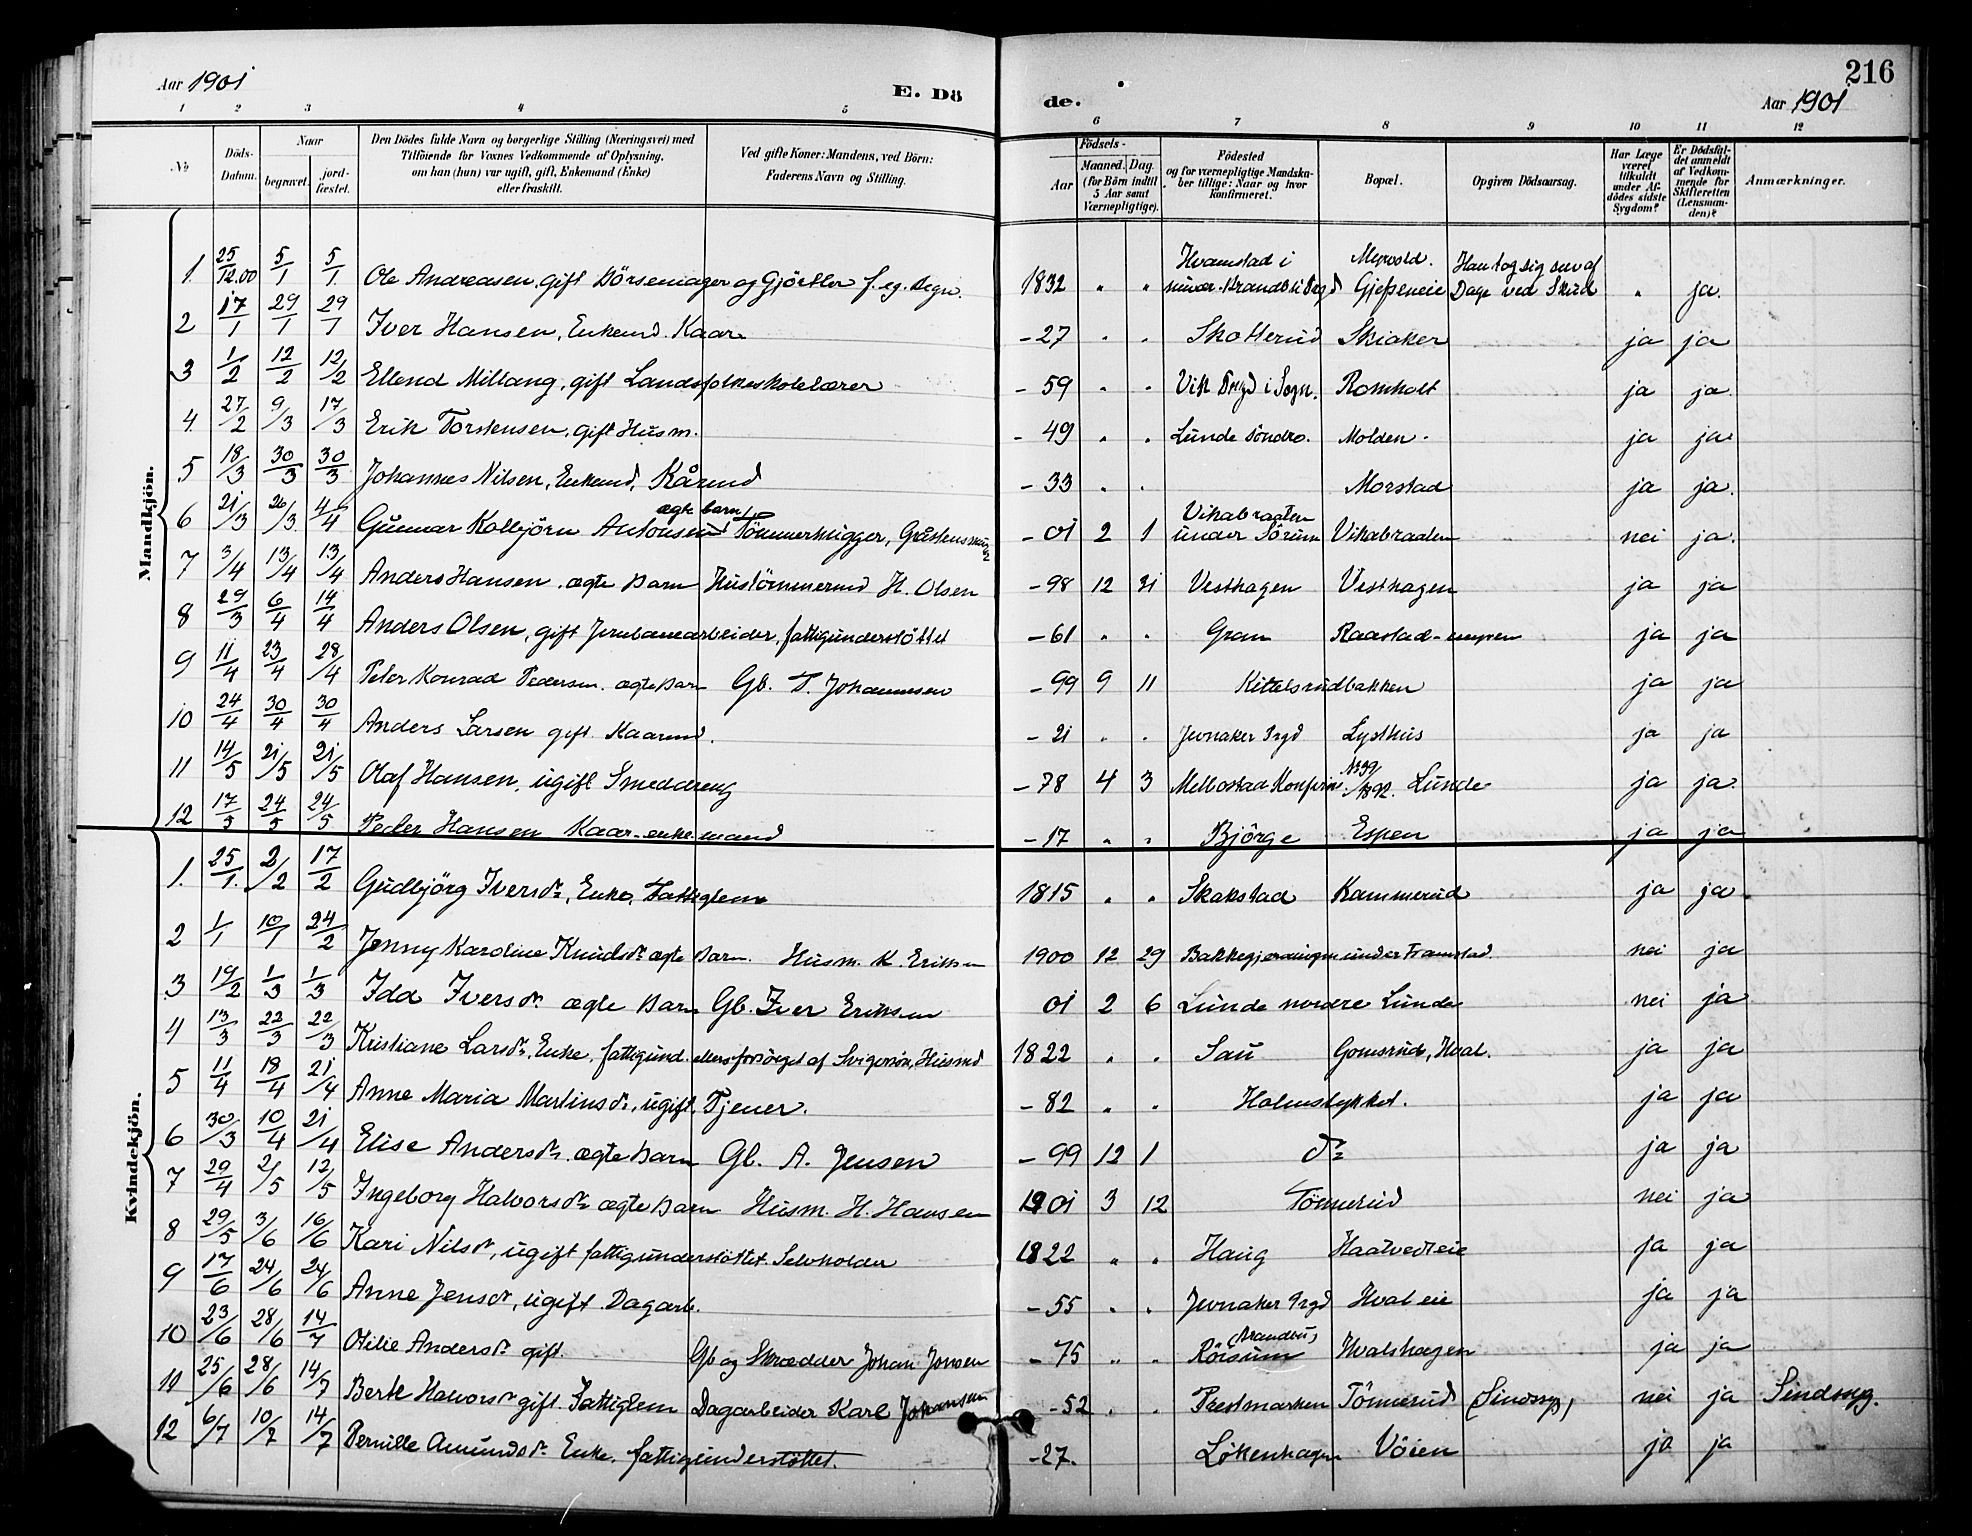 SAH, Gran prestekontor, Ministerialbok nr. 19, 1898-1907, s. 216